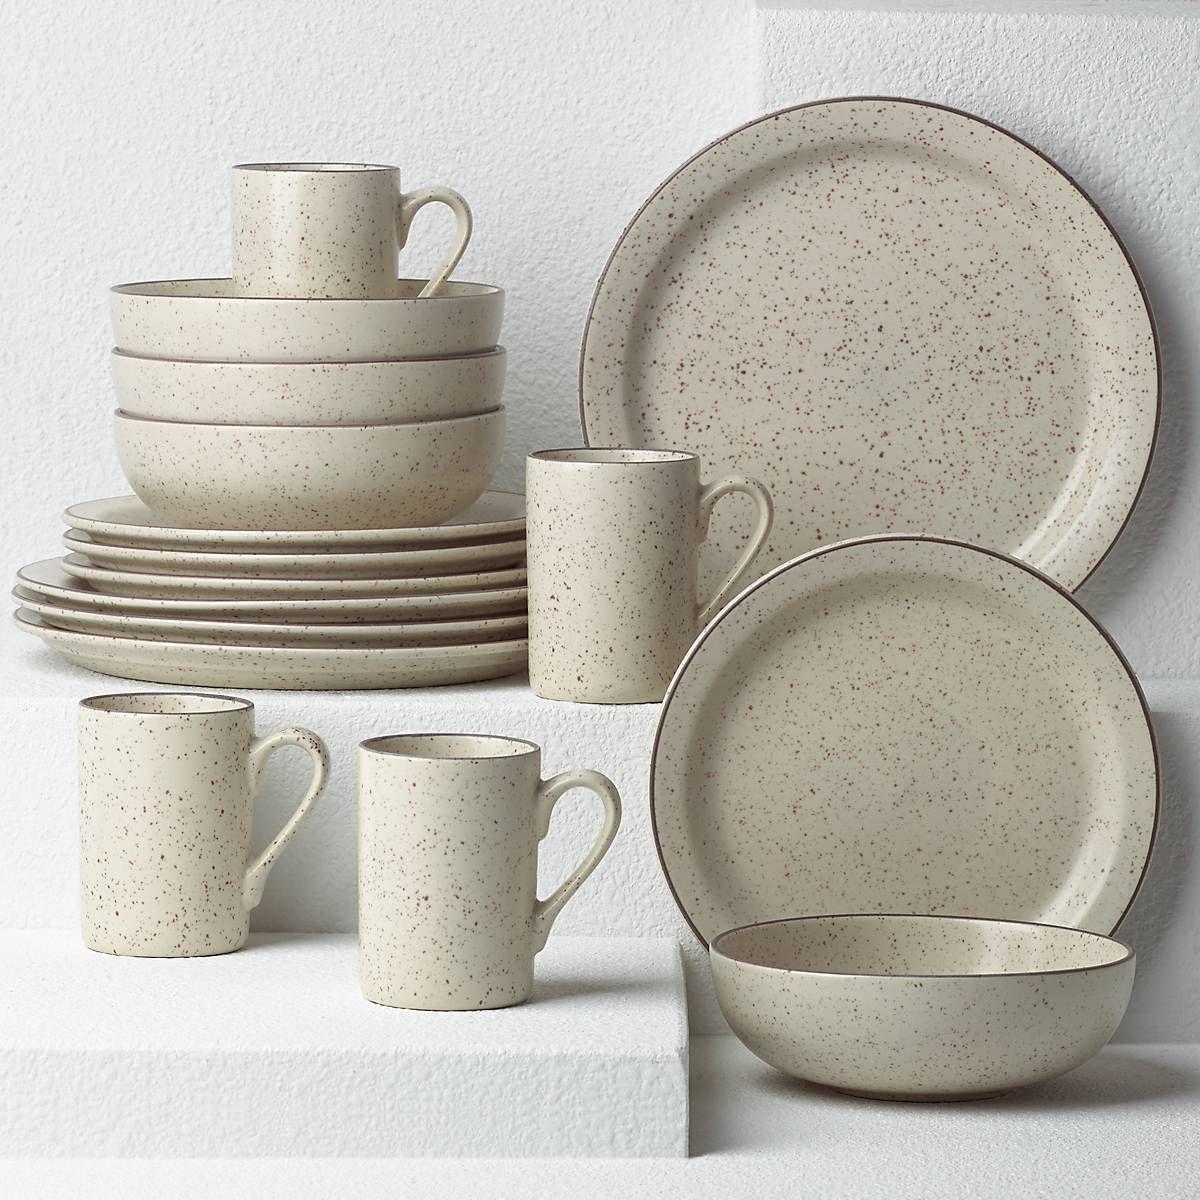 Kallan 16pc Dinnerware Set In 2020 Ceramic Dinnerware Set Dish Sets Dinnerware Rustic Dinnerware